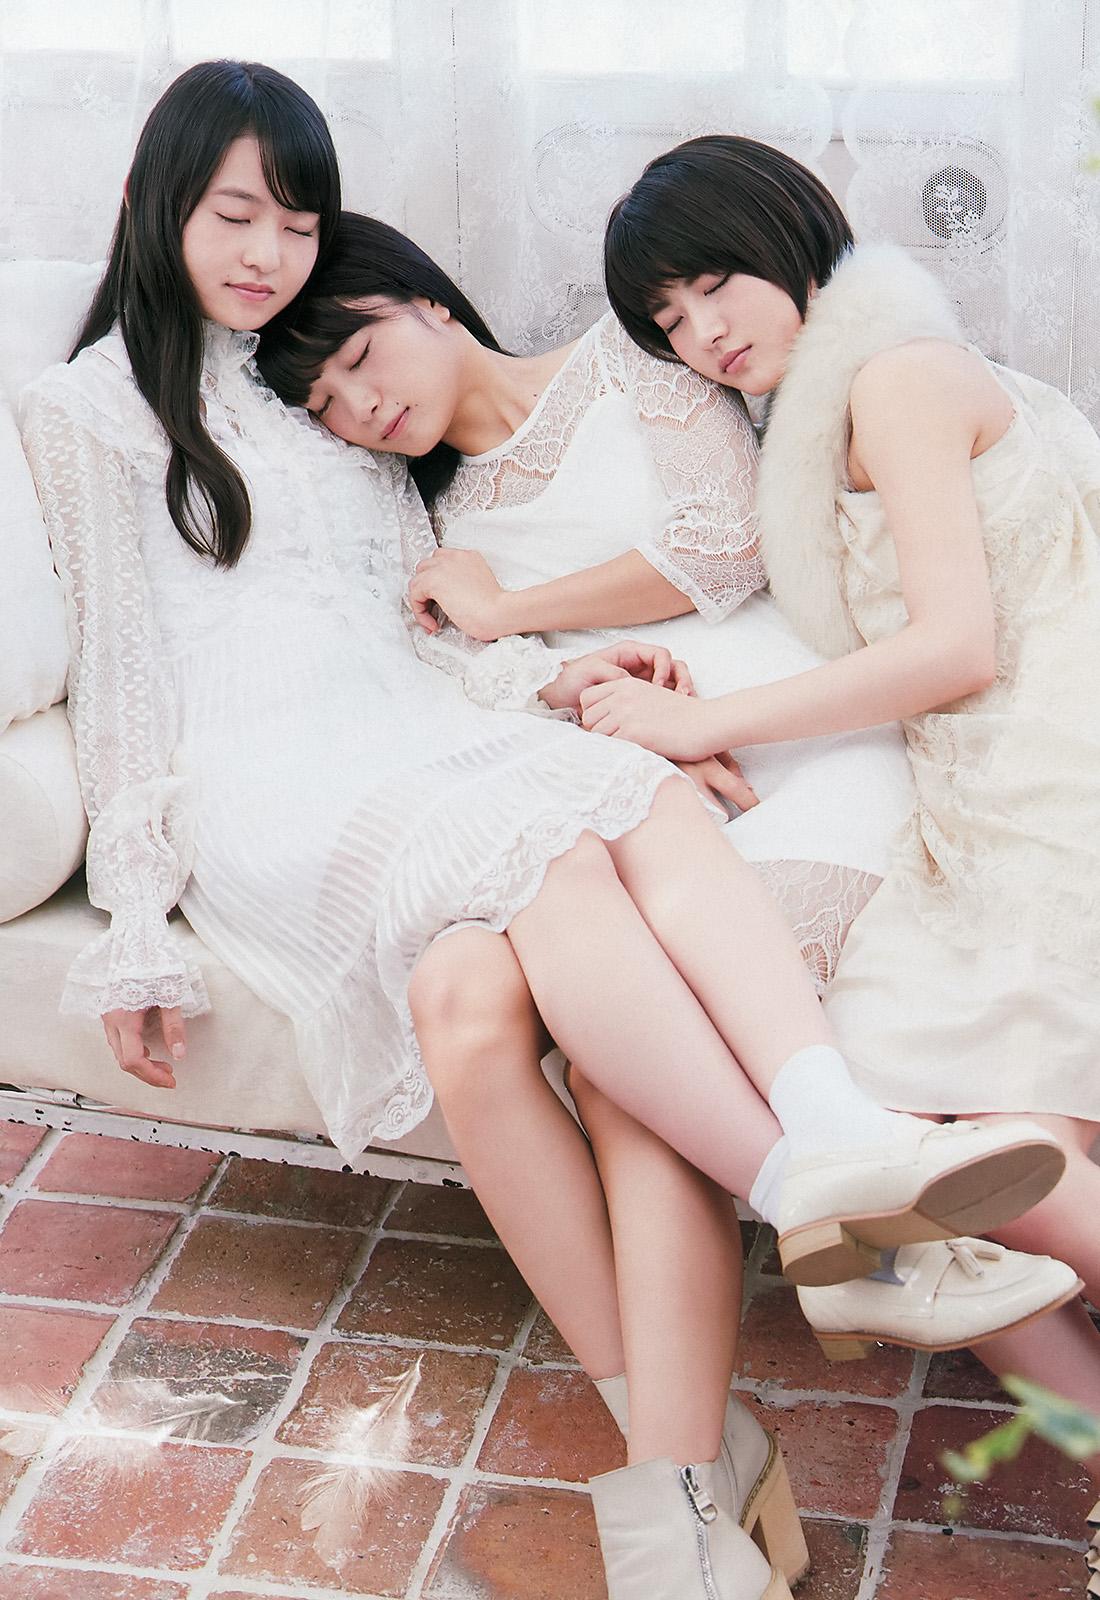 Wakatsuki Yumi 若月佑美, Fukagawa Mai 深川麻衣, Ito Marika 伊藤万理華 Le repos d'ange 2